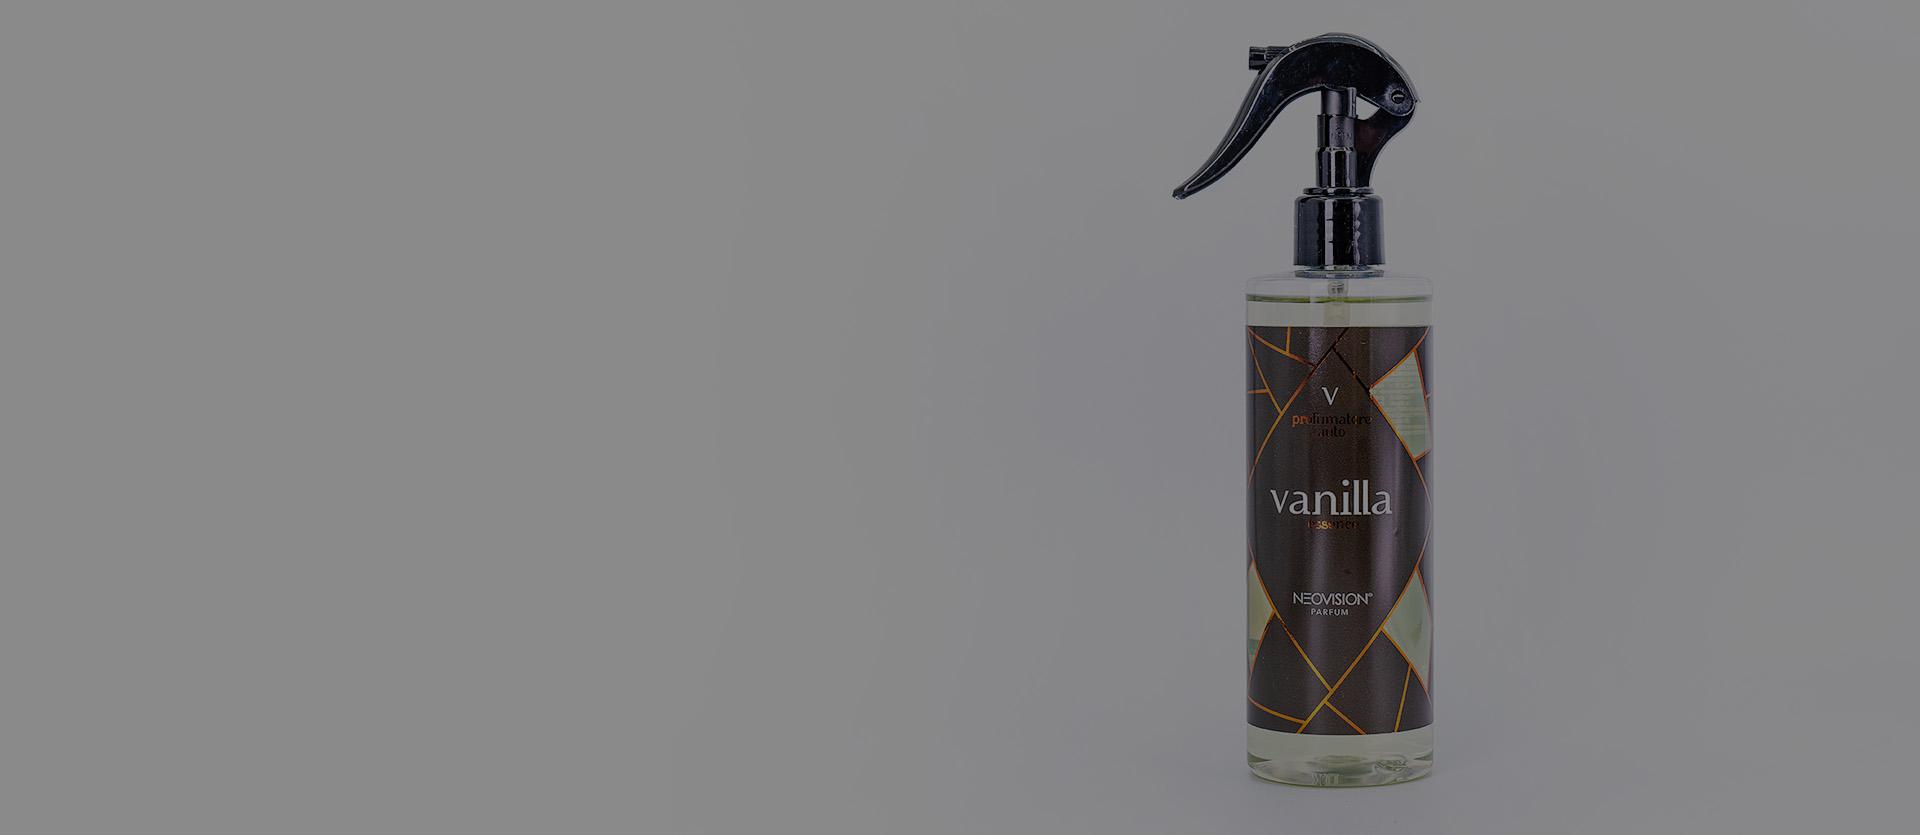 neovision vanilla